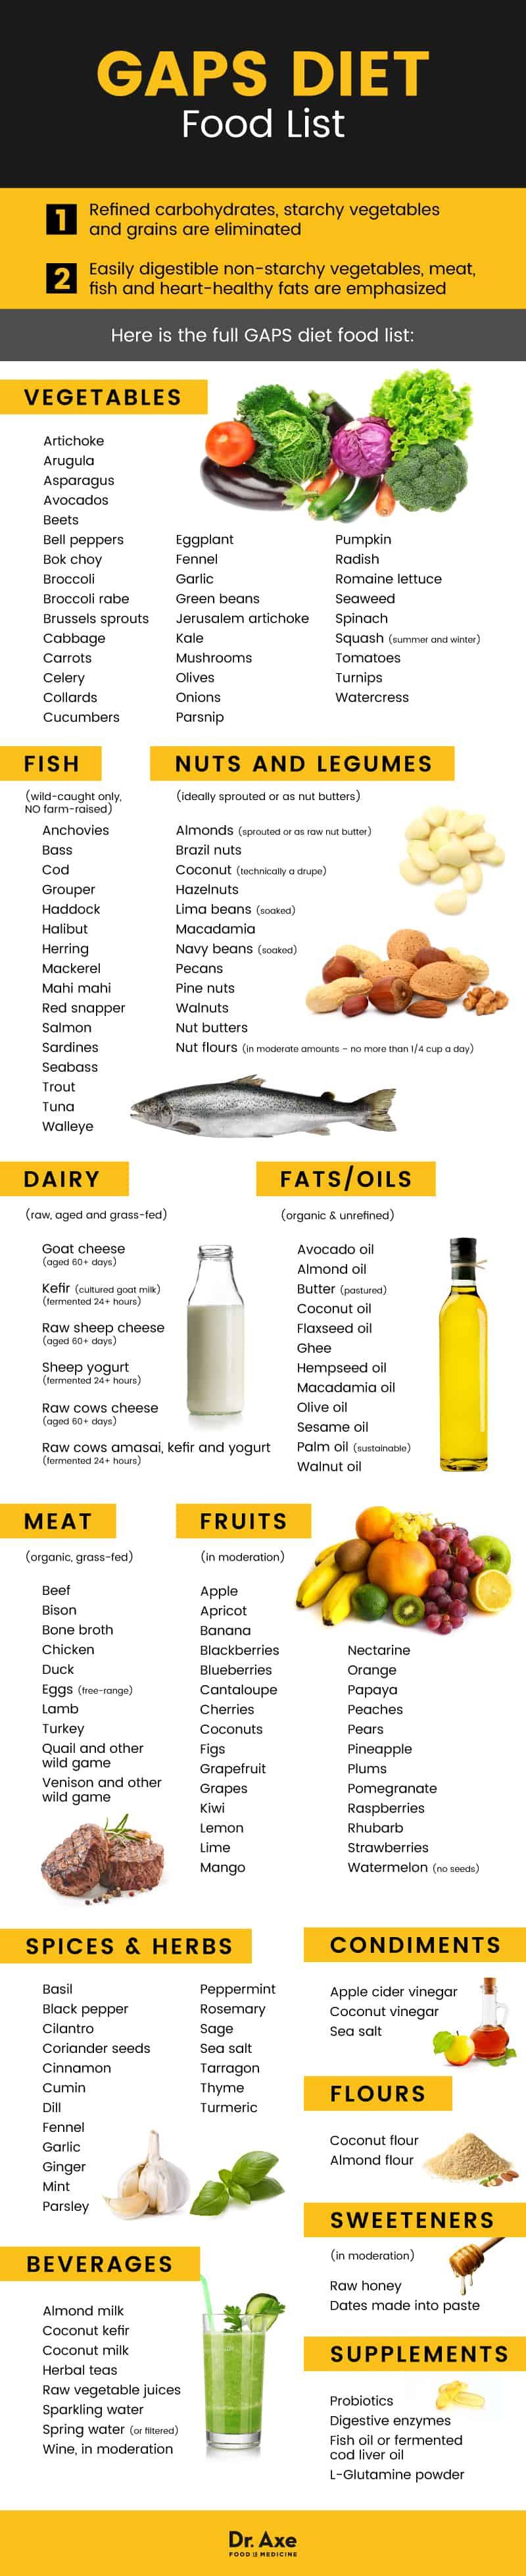 GAPS diet food list - Dr. Axe